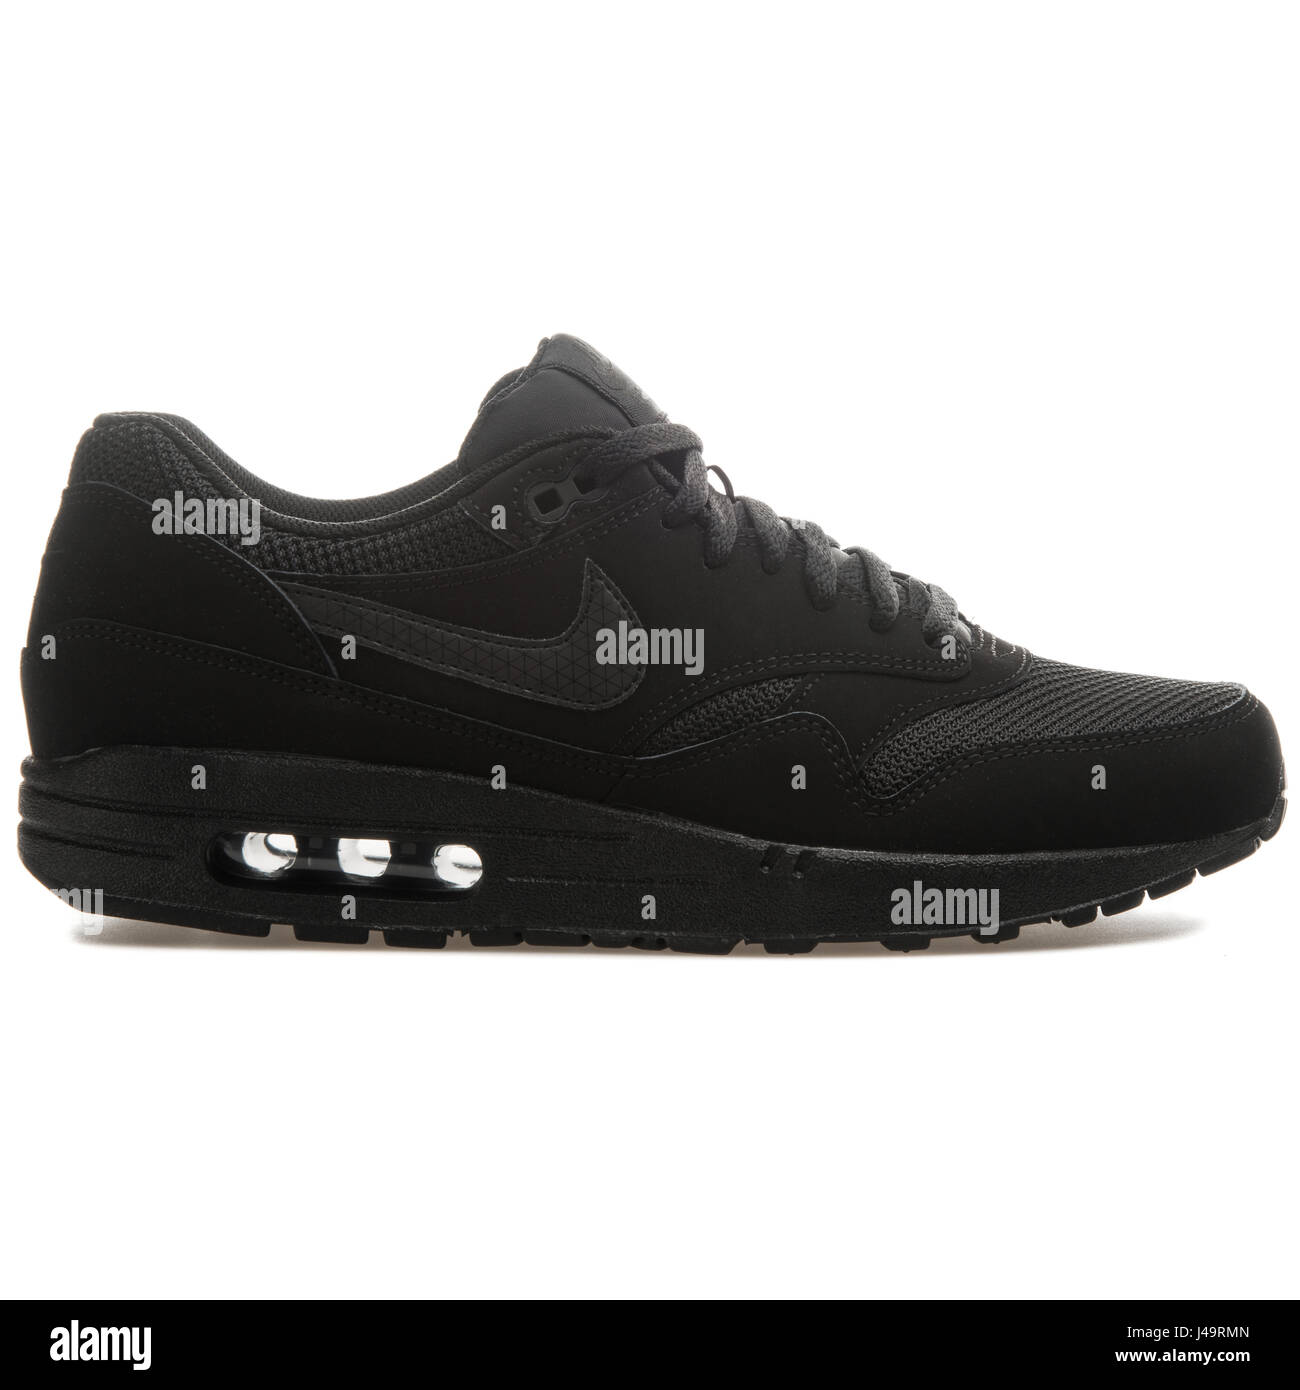 nike air max blancas y negras, Nike 537383 025 air max 1